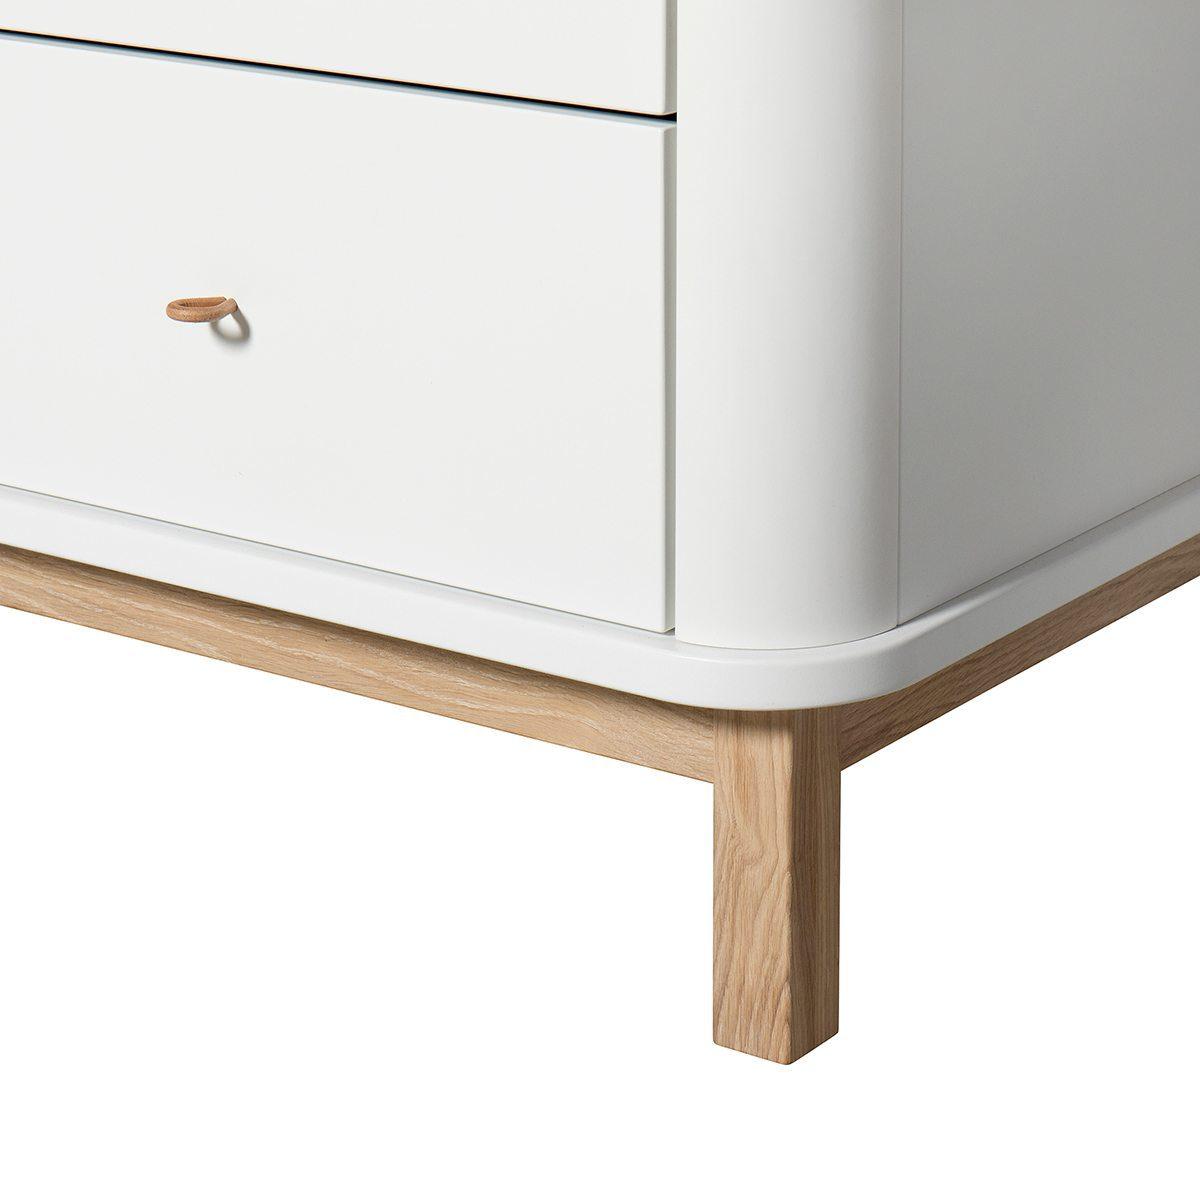 Oliver Furniture Commode Wood white oak detail